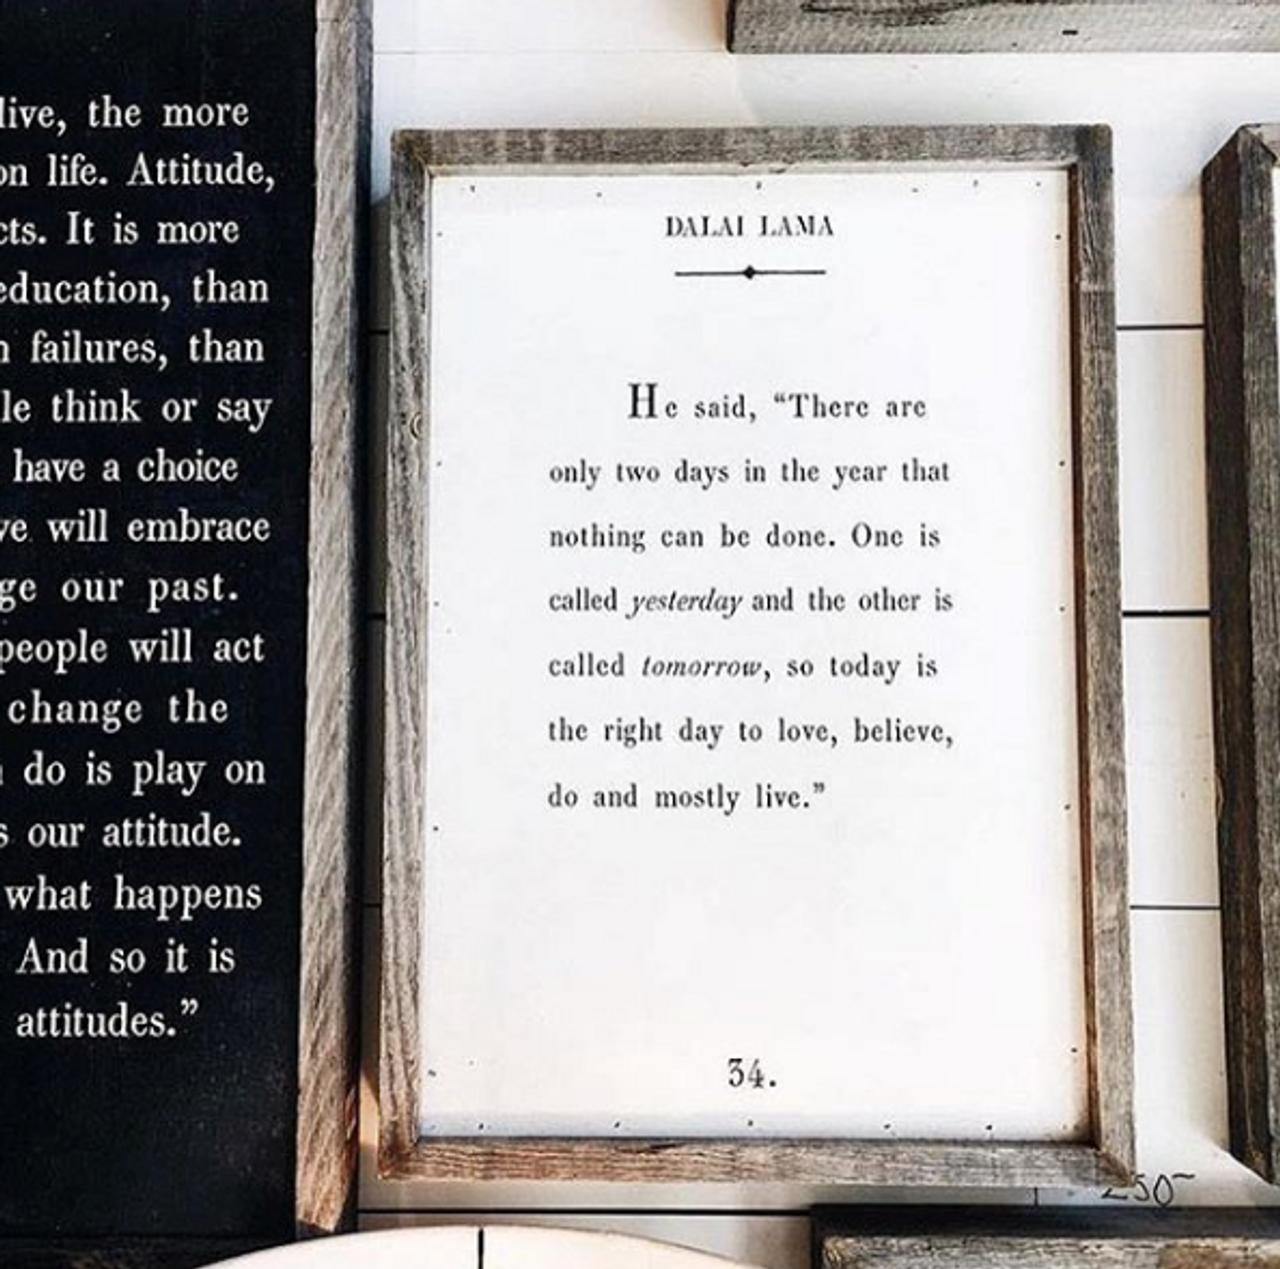 dalai lama art print - white with grey wood frame